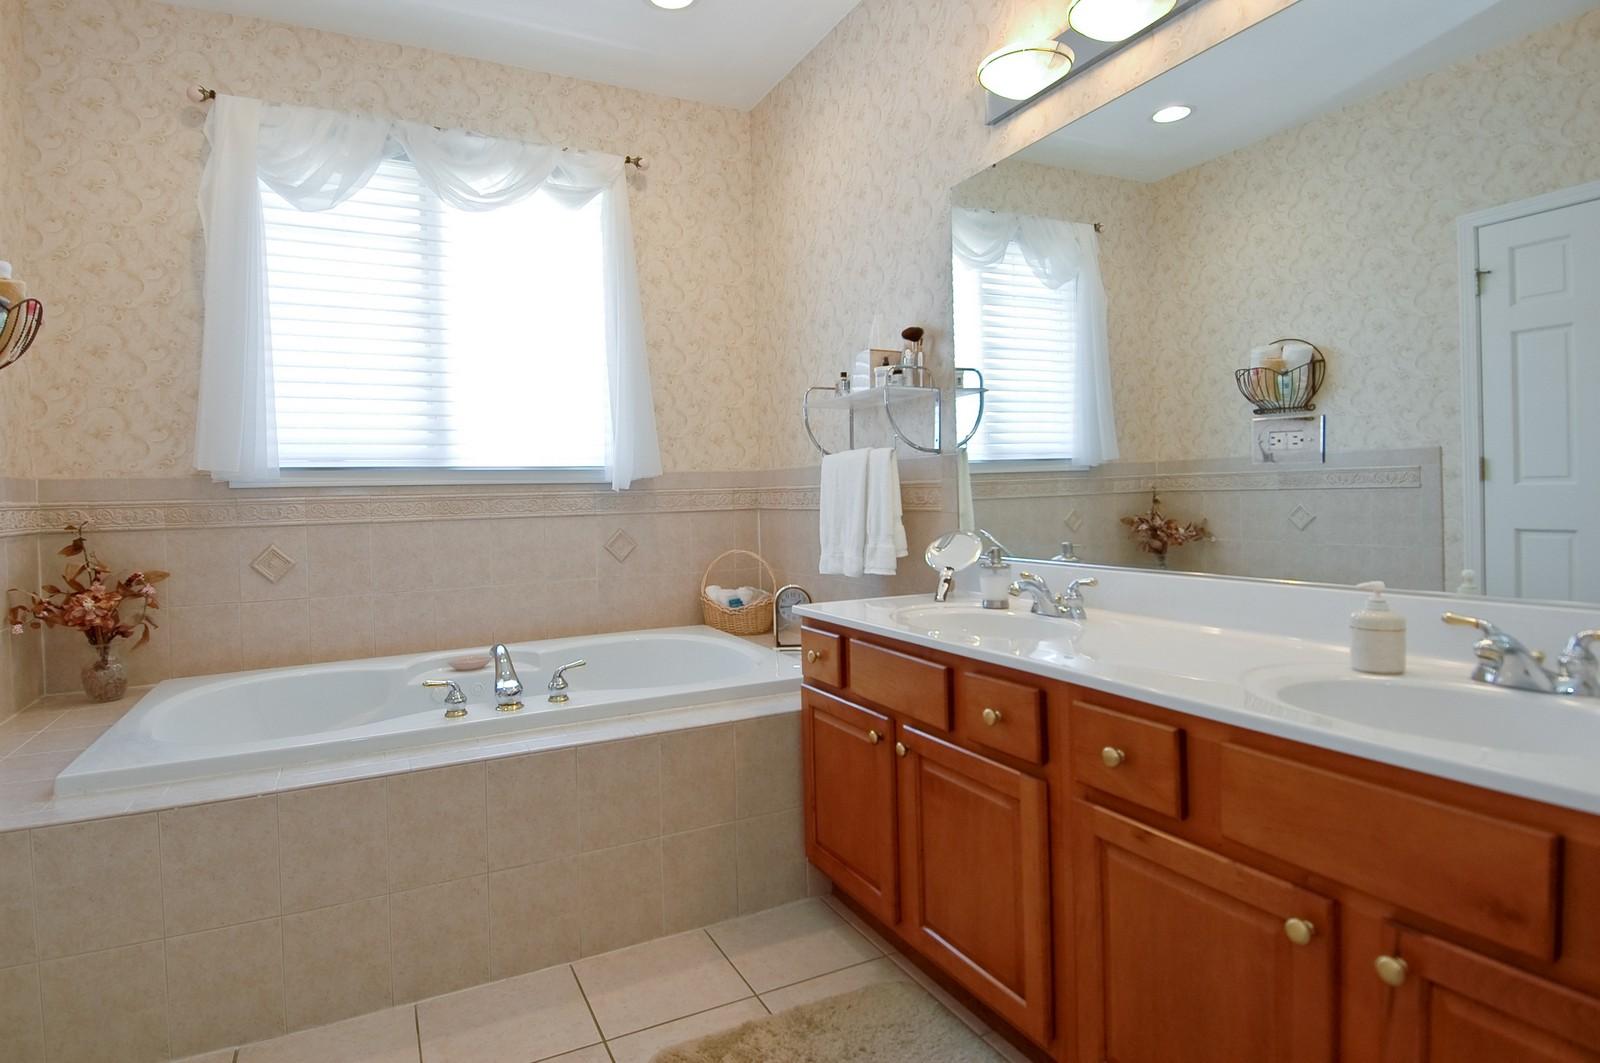 Real Estate Photography - 8719 Shade Tree Circle, Village of Lakewood, IL, 60014 - Master Bathroom